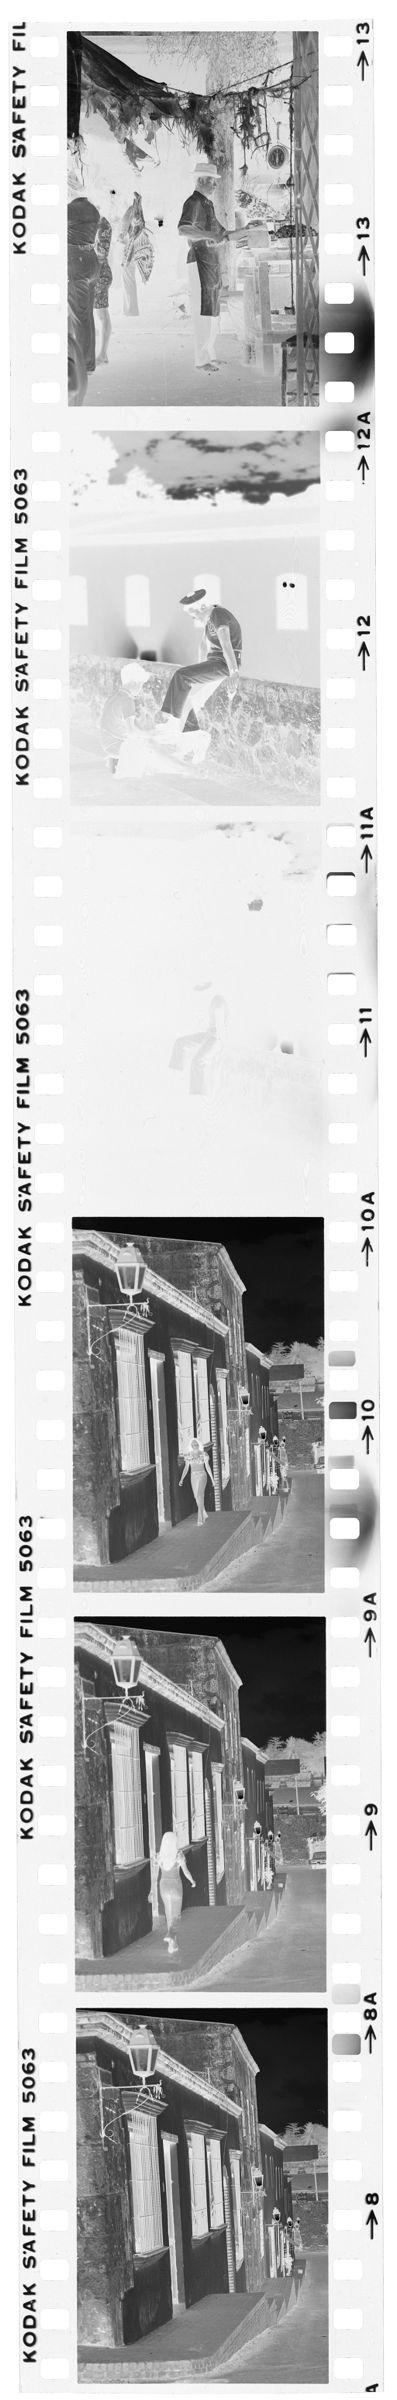 Untitled (Stone Buildings Along Side Of Street; Sailor Sitting On Stone Ledge; Market)